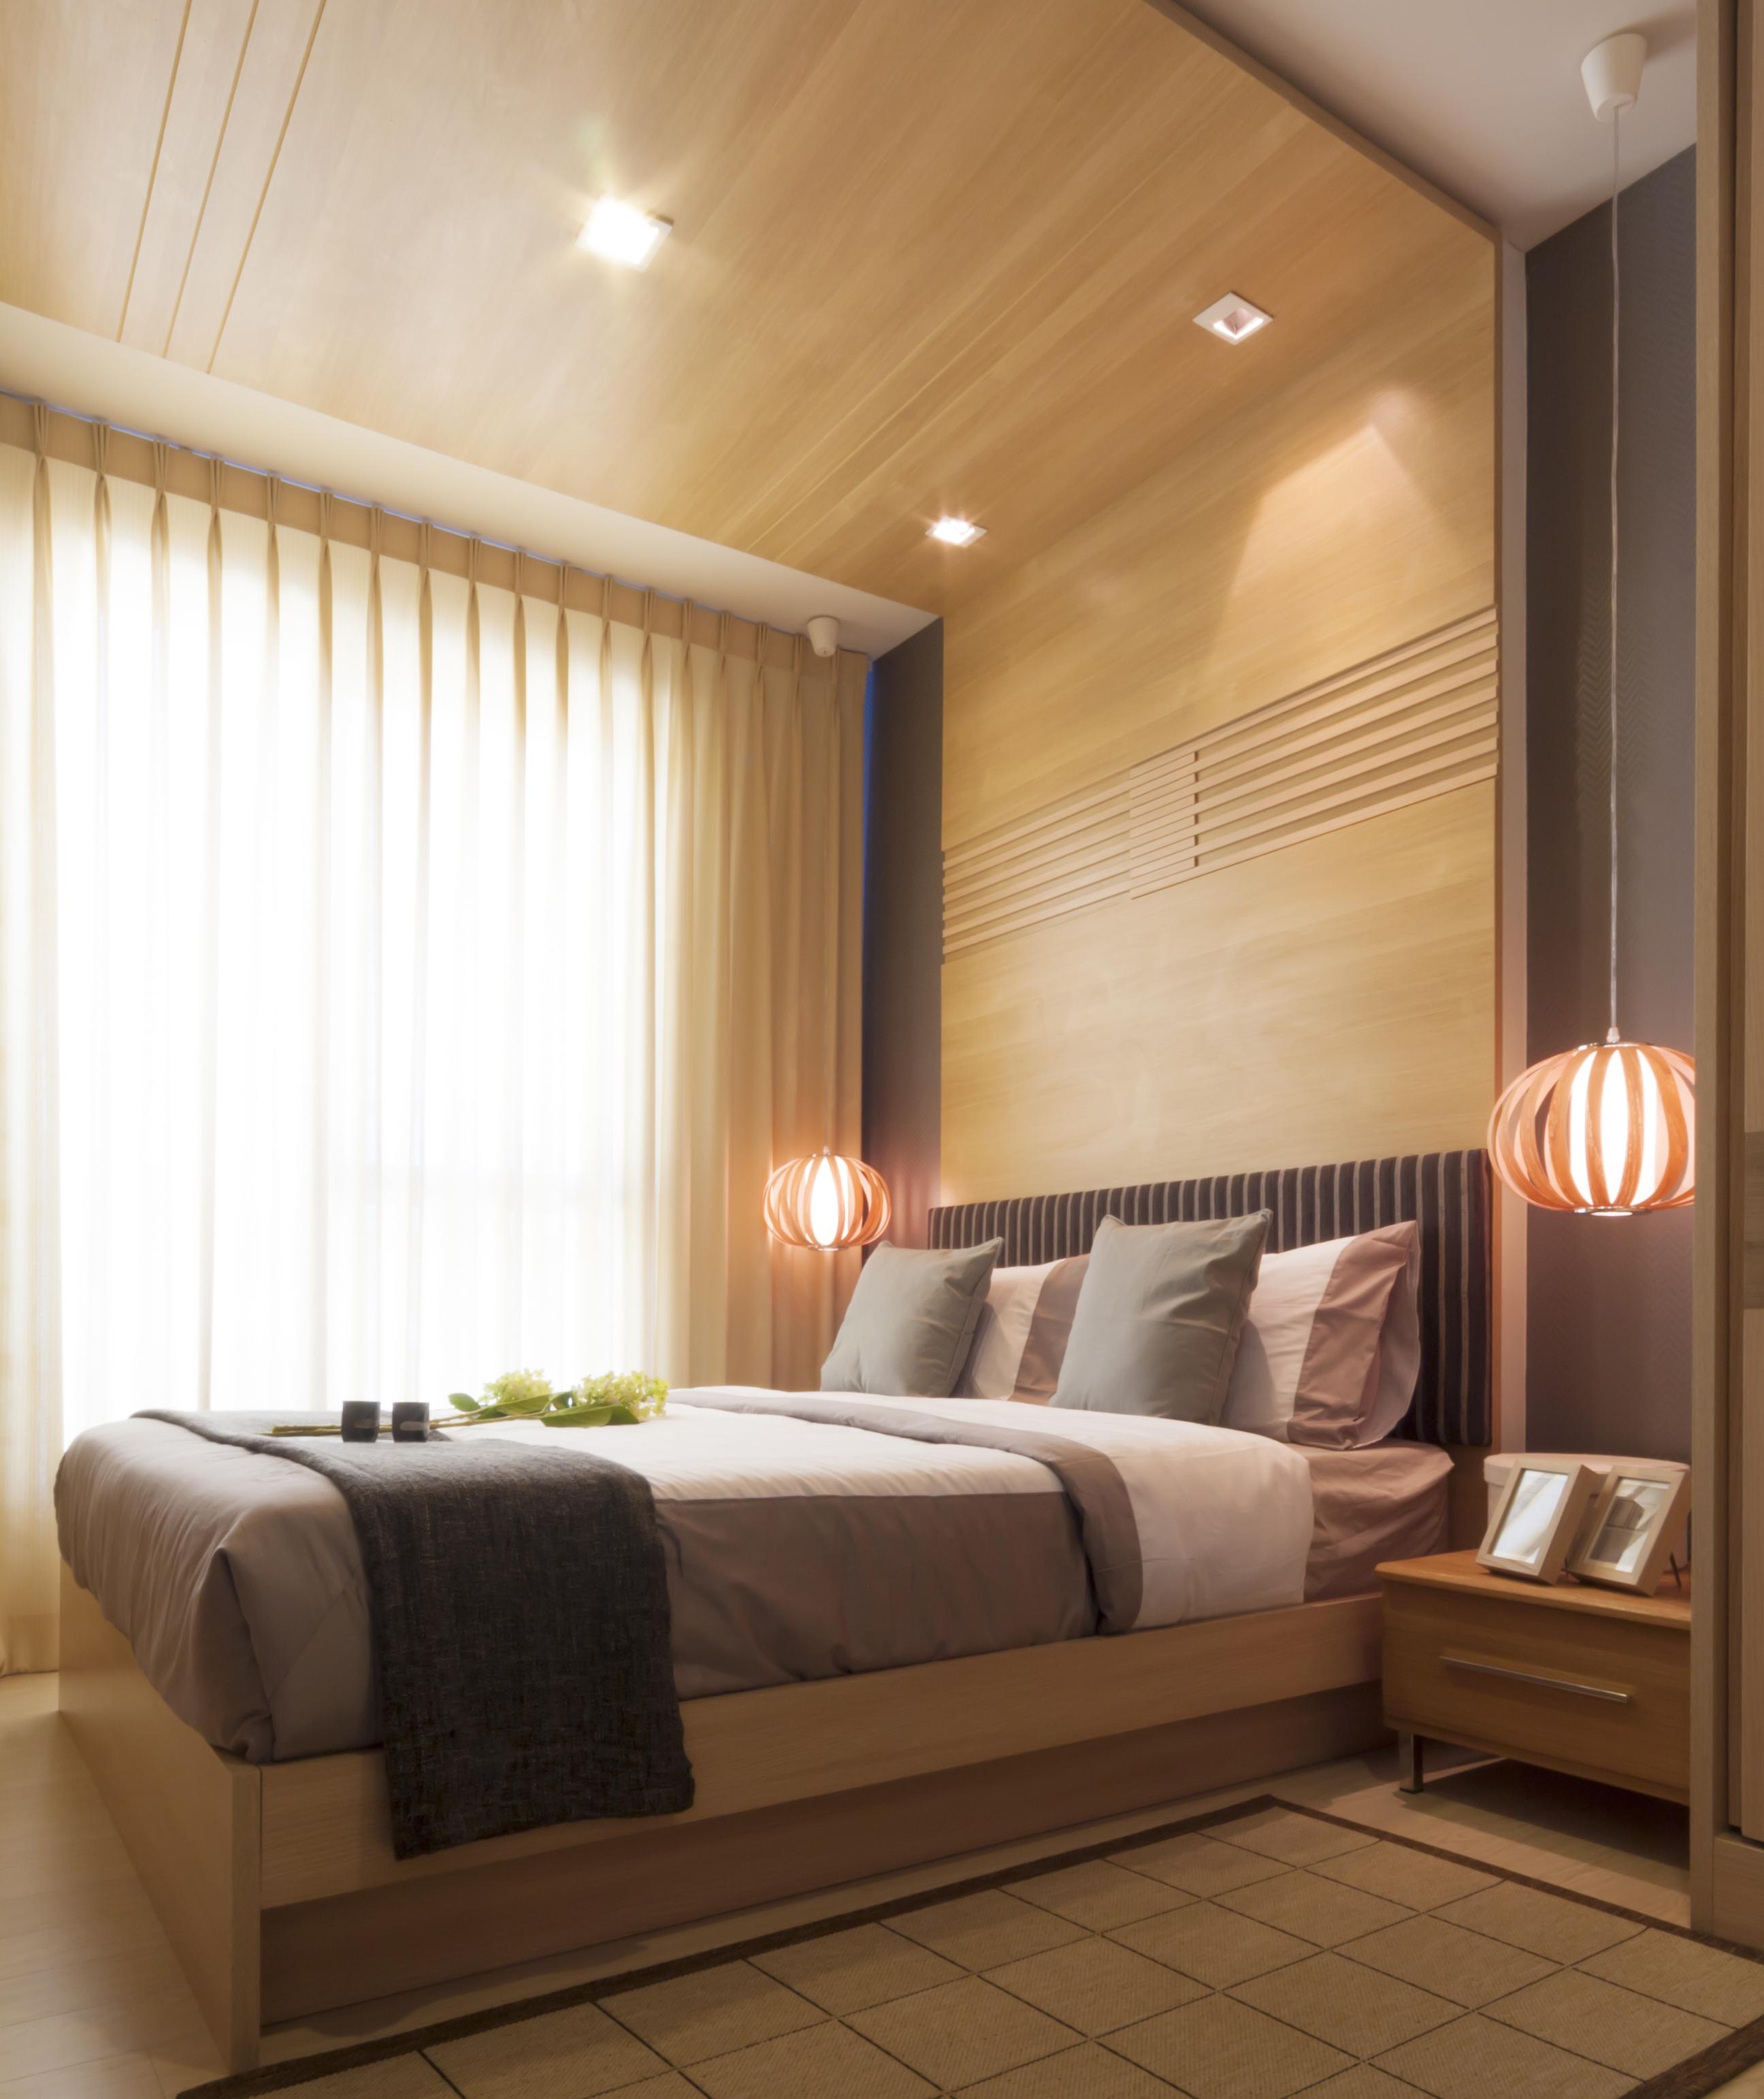 Bedroom Furniture Manufacturers List: Wooden Home Furniture Manufacturers In India